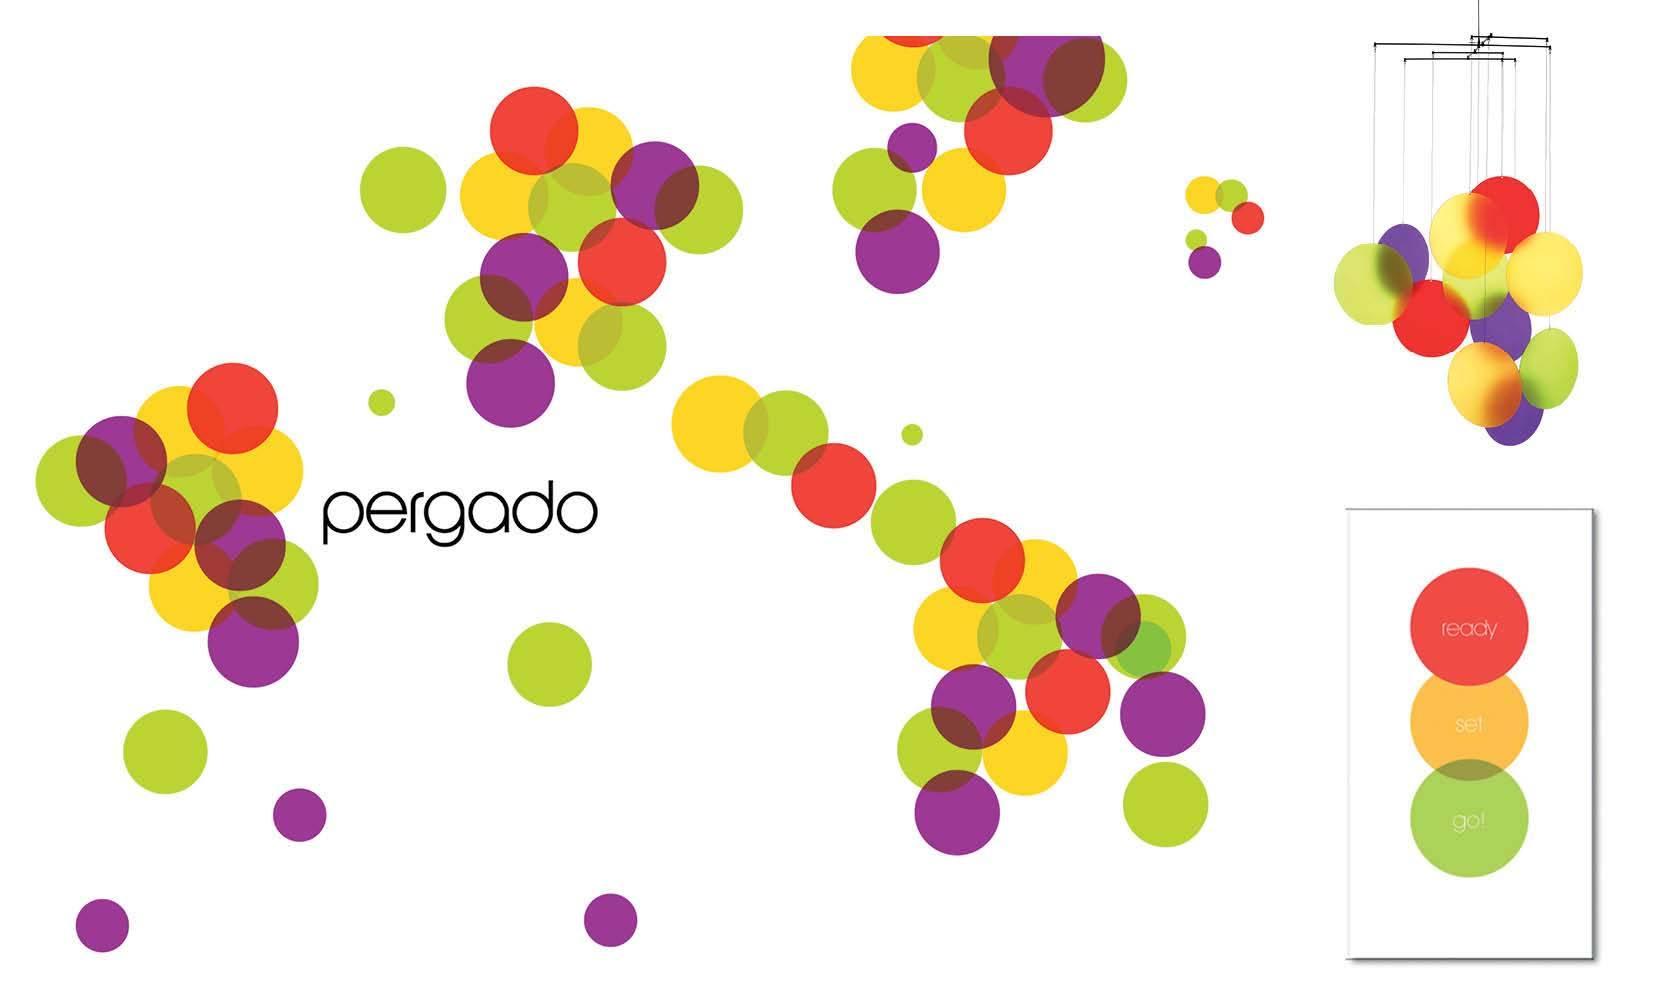 WMH-SYNGENTA-PERGADO-WEB image